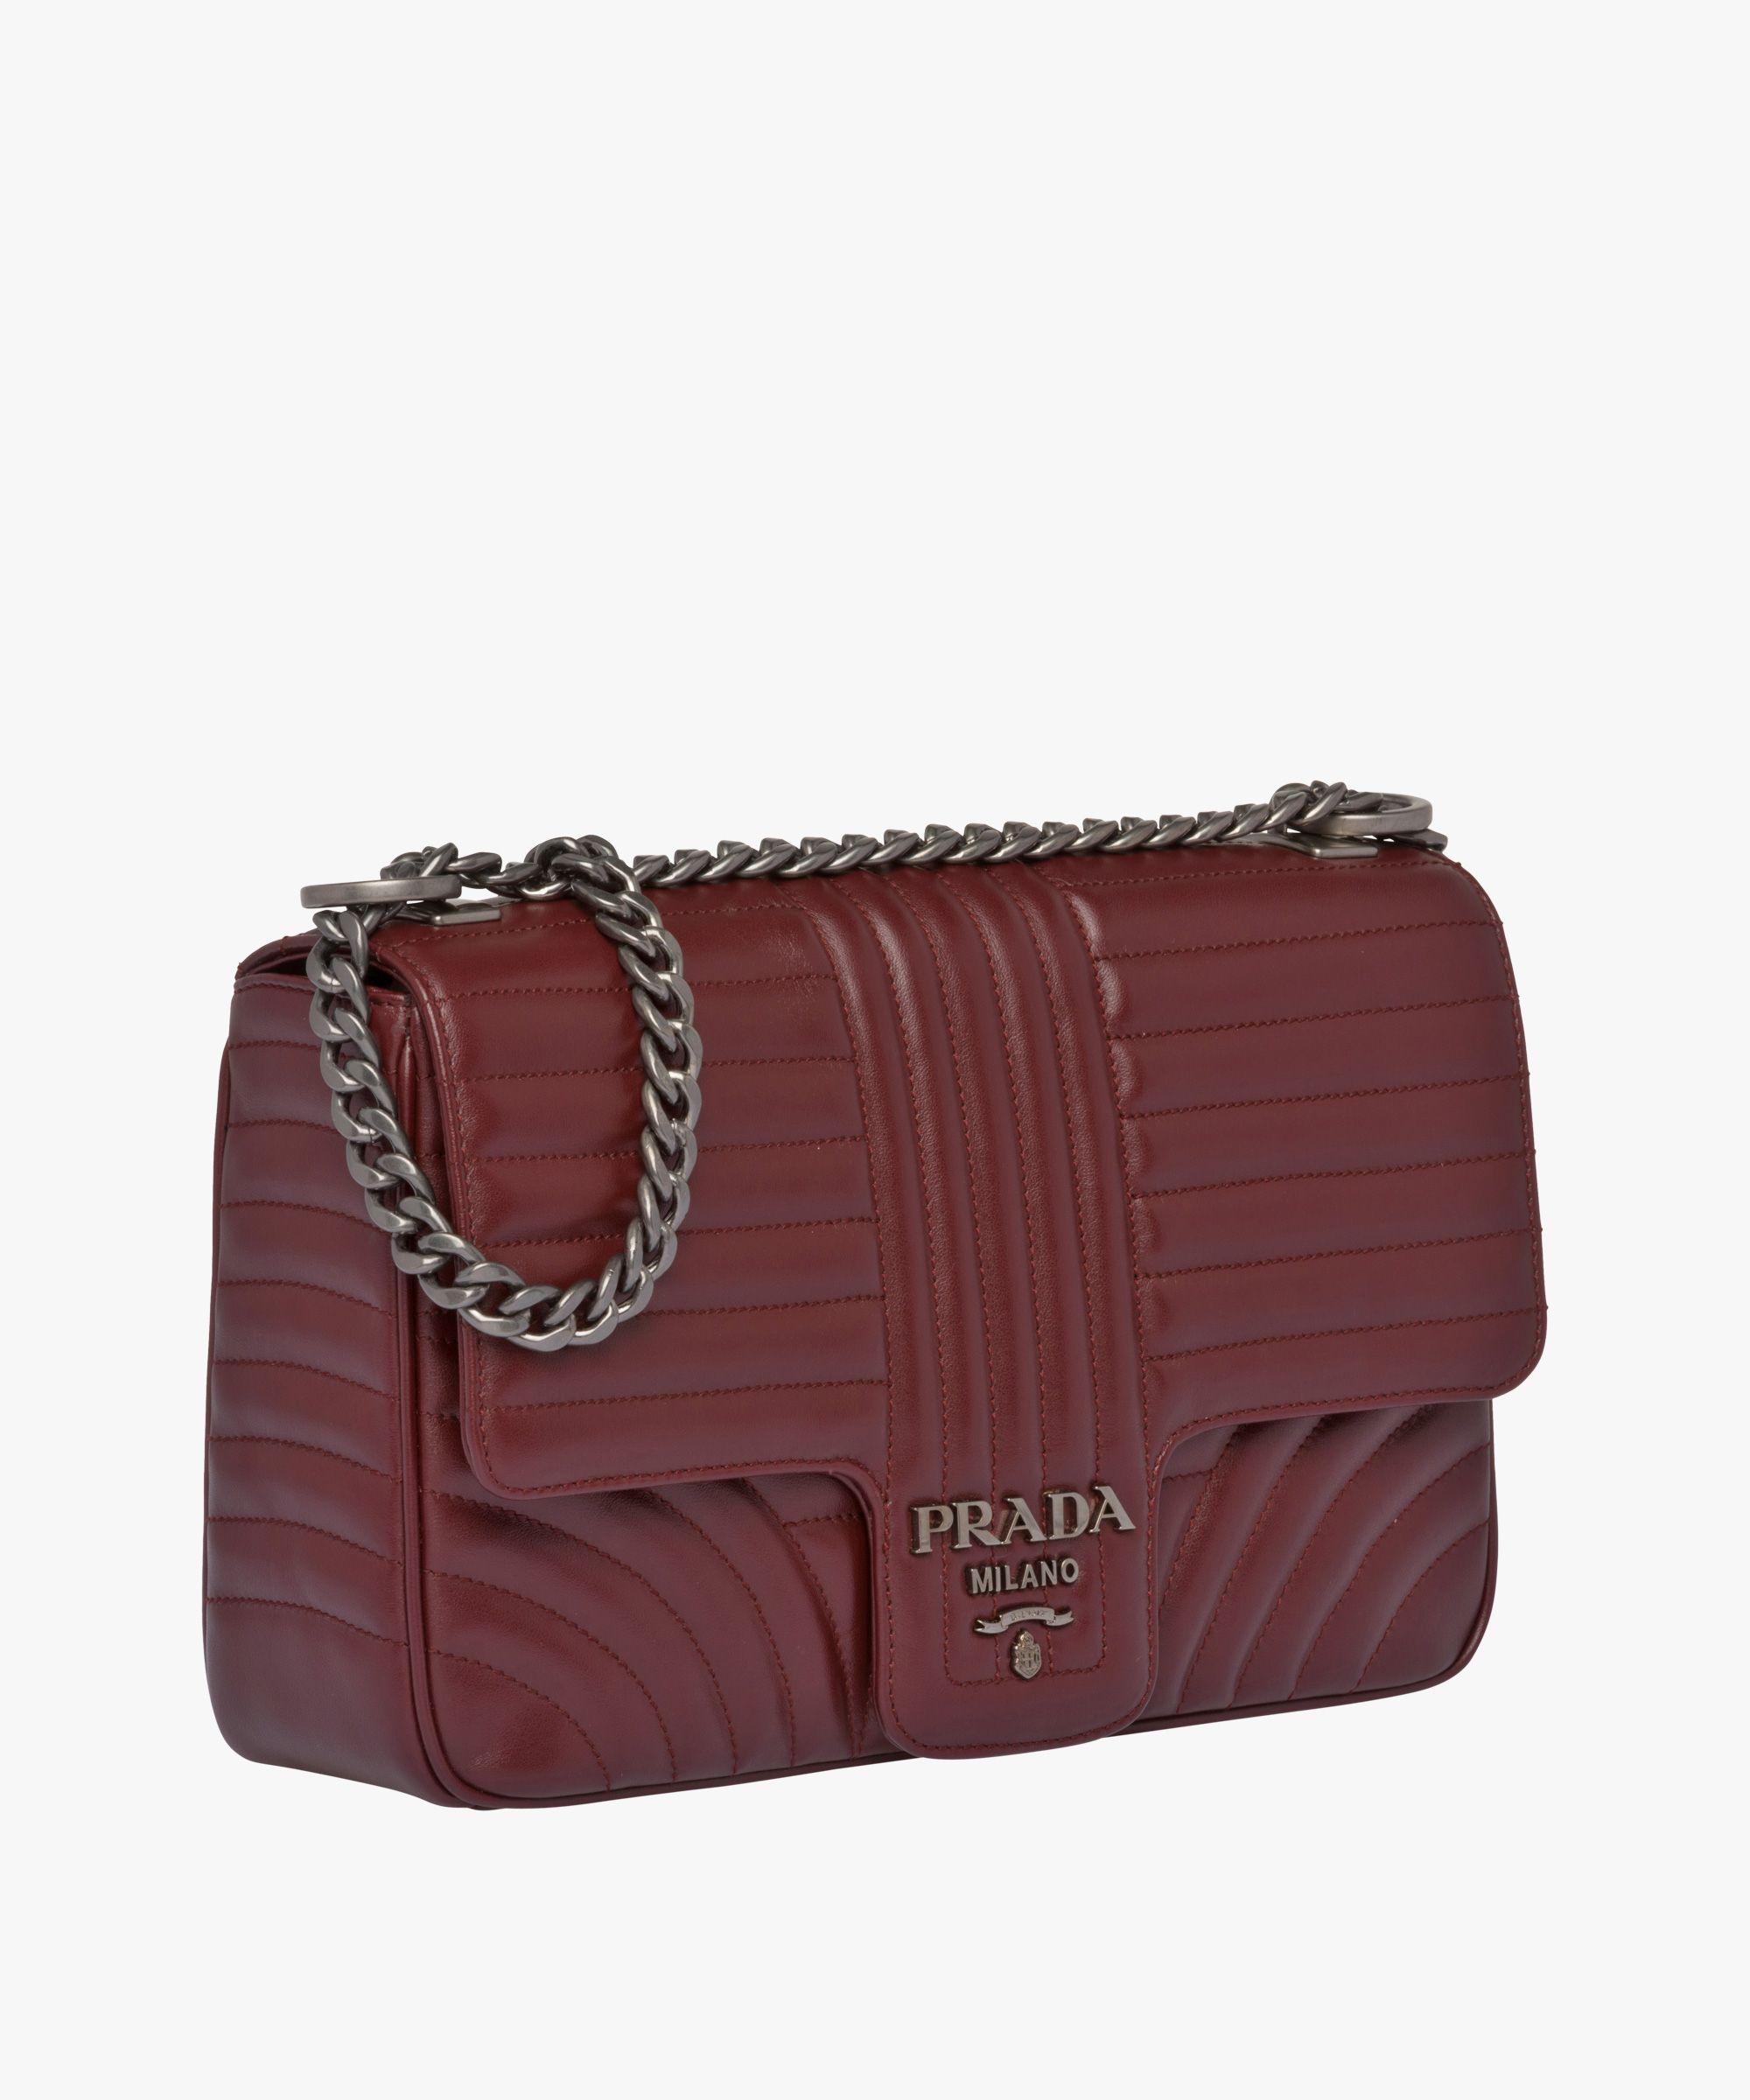 43f701deb3ee Prada Diagramme leather shoulder bag Prada GARNET 3